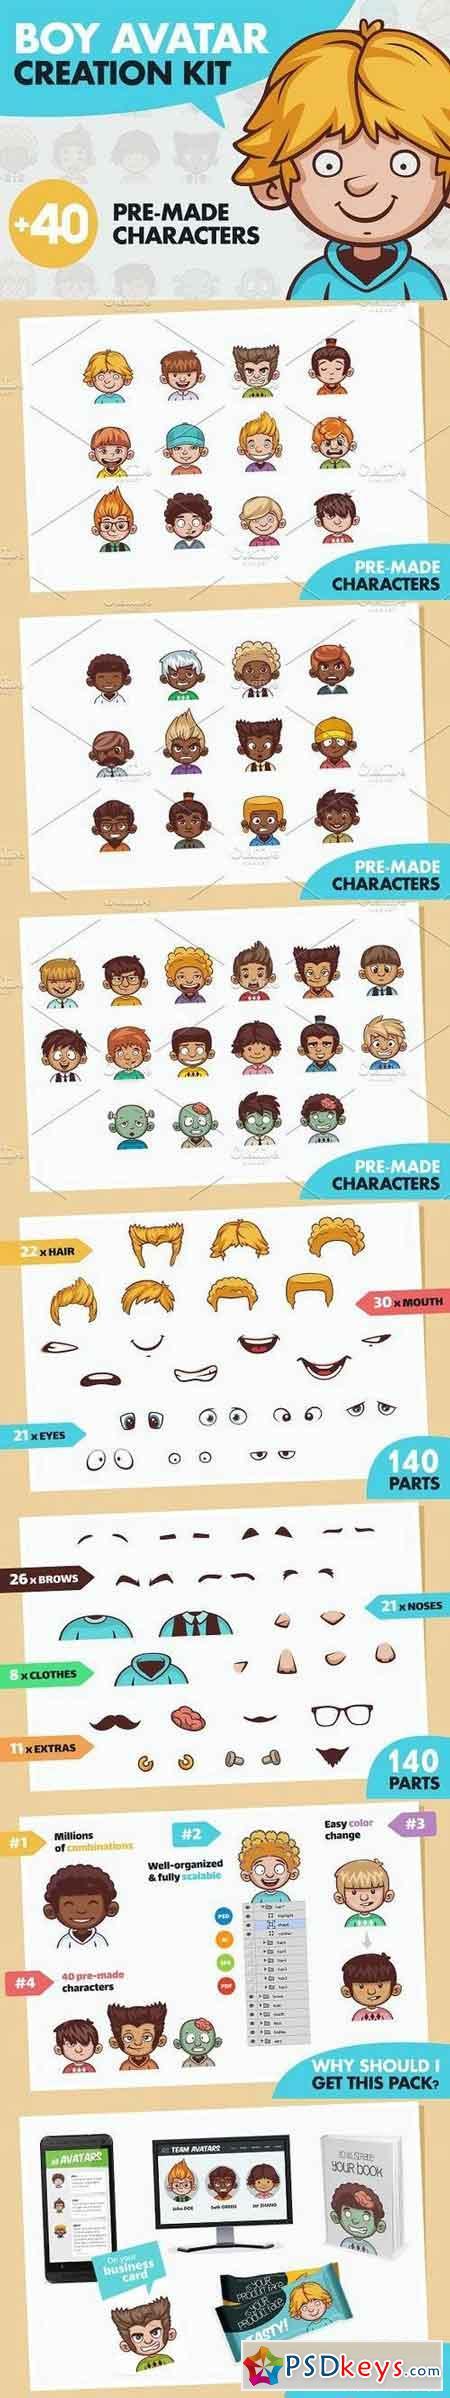 Cartoon Boy Avatar Creation Kit 1393542